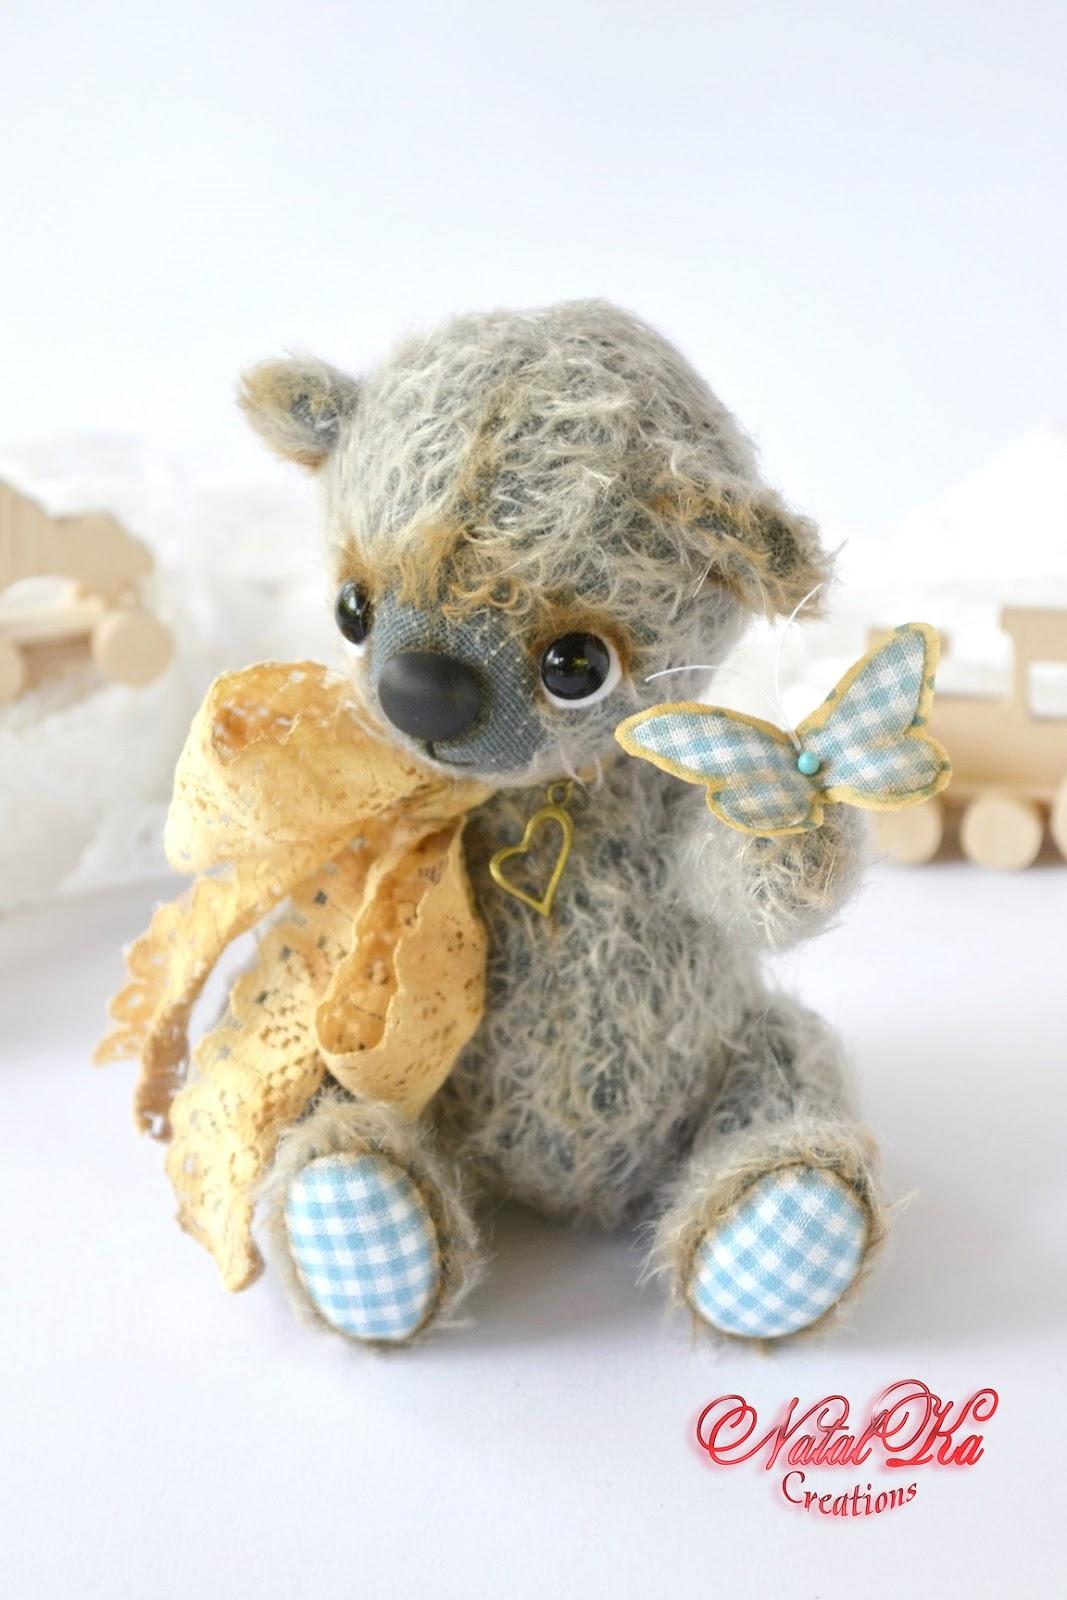 Künstlerteddybär handgemacht von NatalKa Creations. Artist teddy bear handmade by NatalKa Creations.